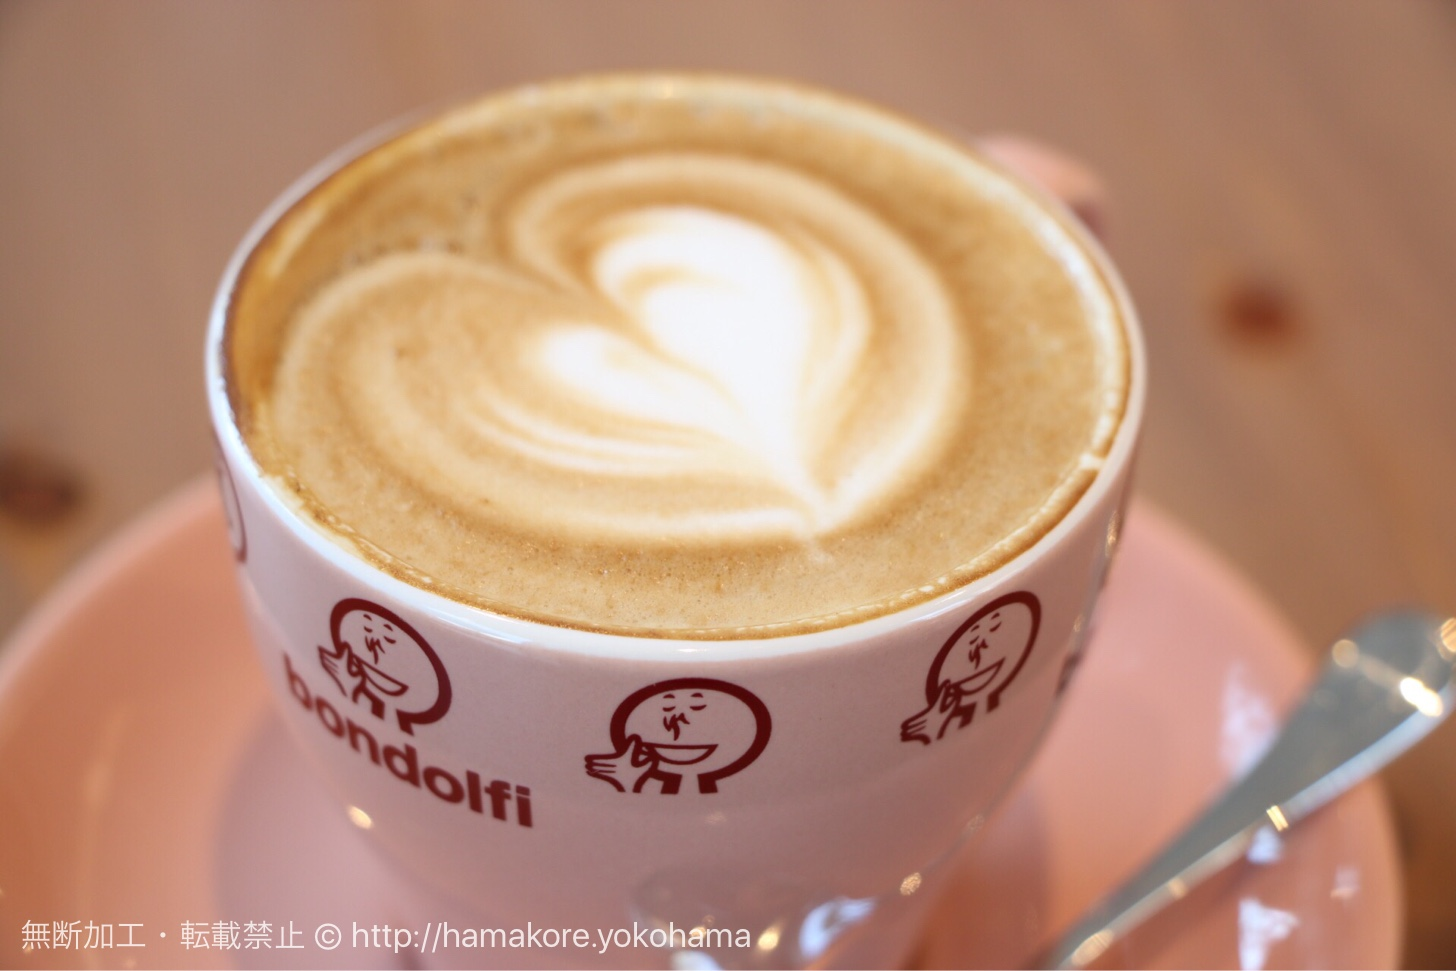 Bondolfi boncaffe(ボンドルフィボンカフェ) カプチーノ